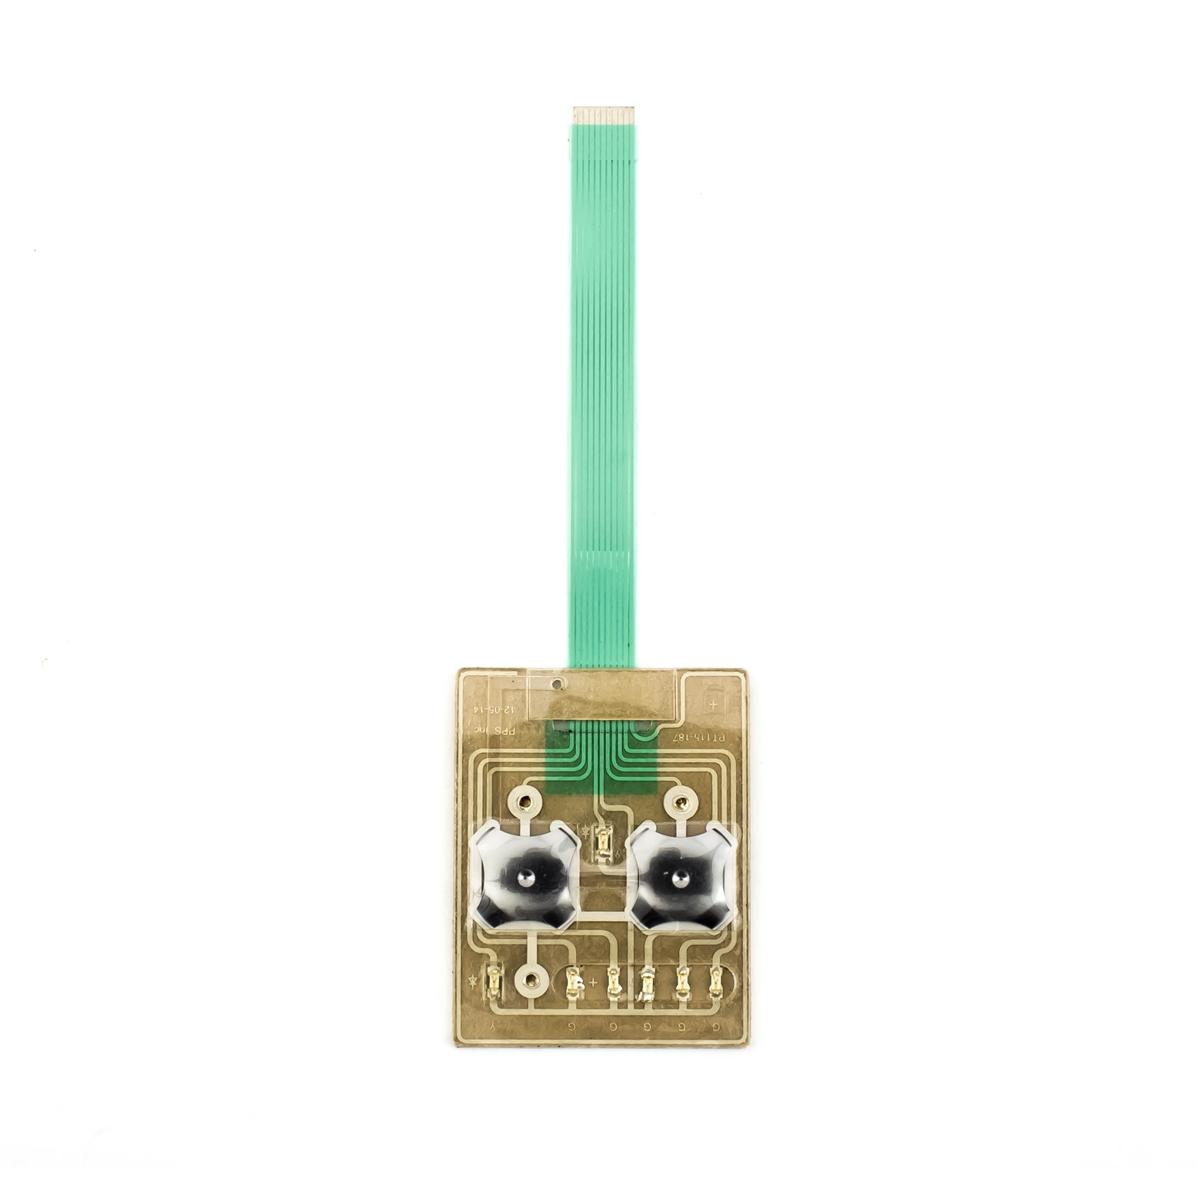 Philips M2601A Series C Standard Telemetry Transmitter LED Flex Board